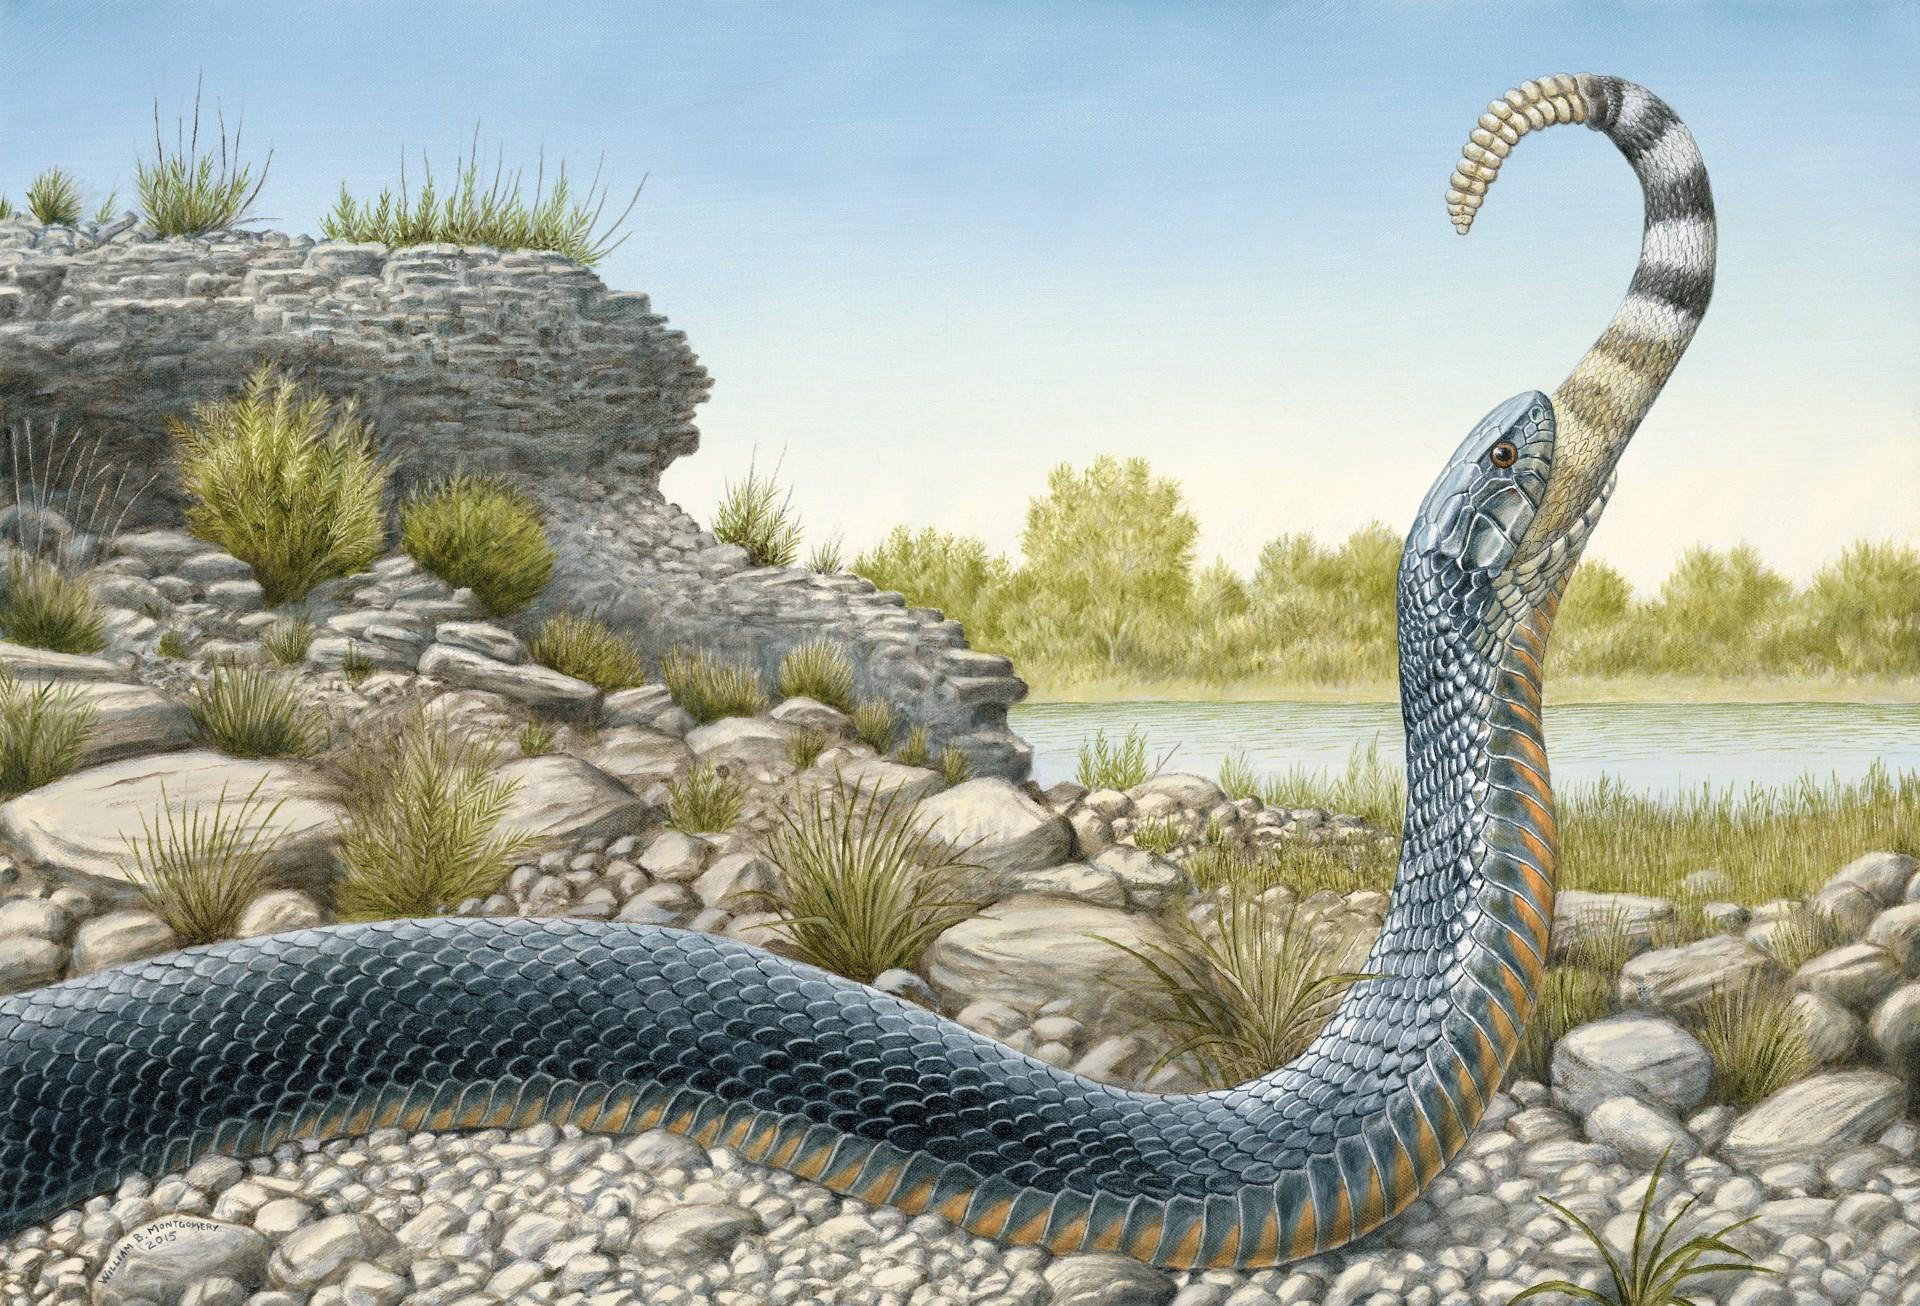 Texas Indigo Snake by William B. Montgomery